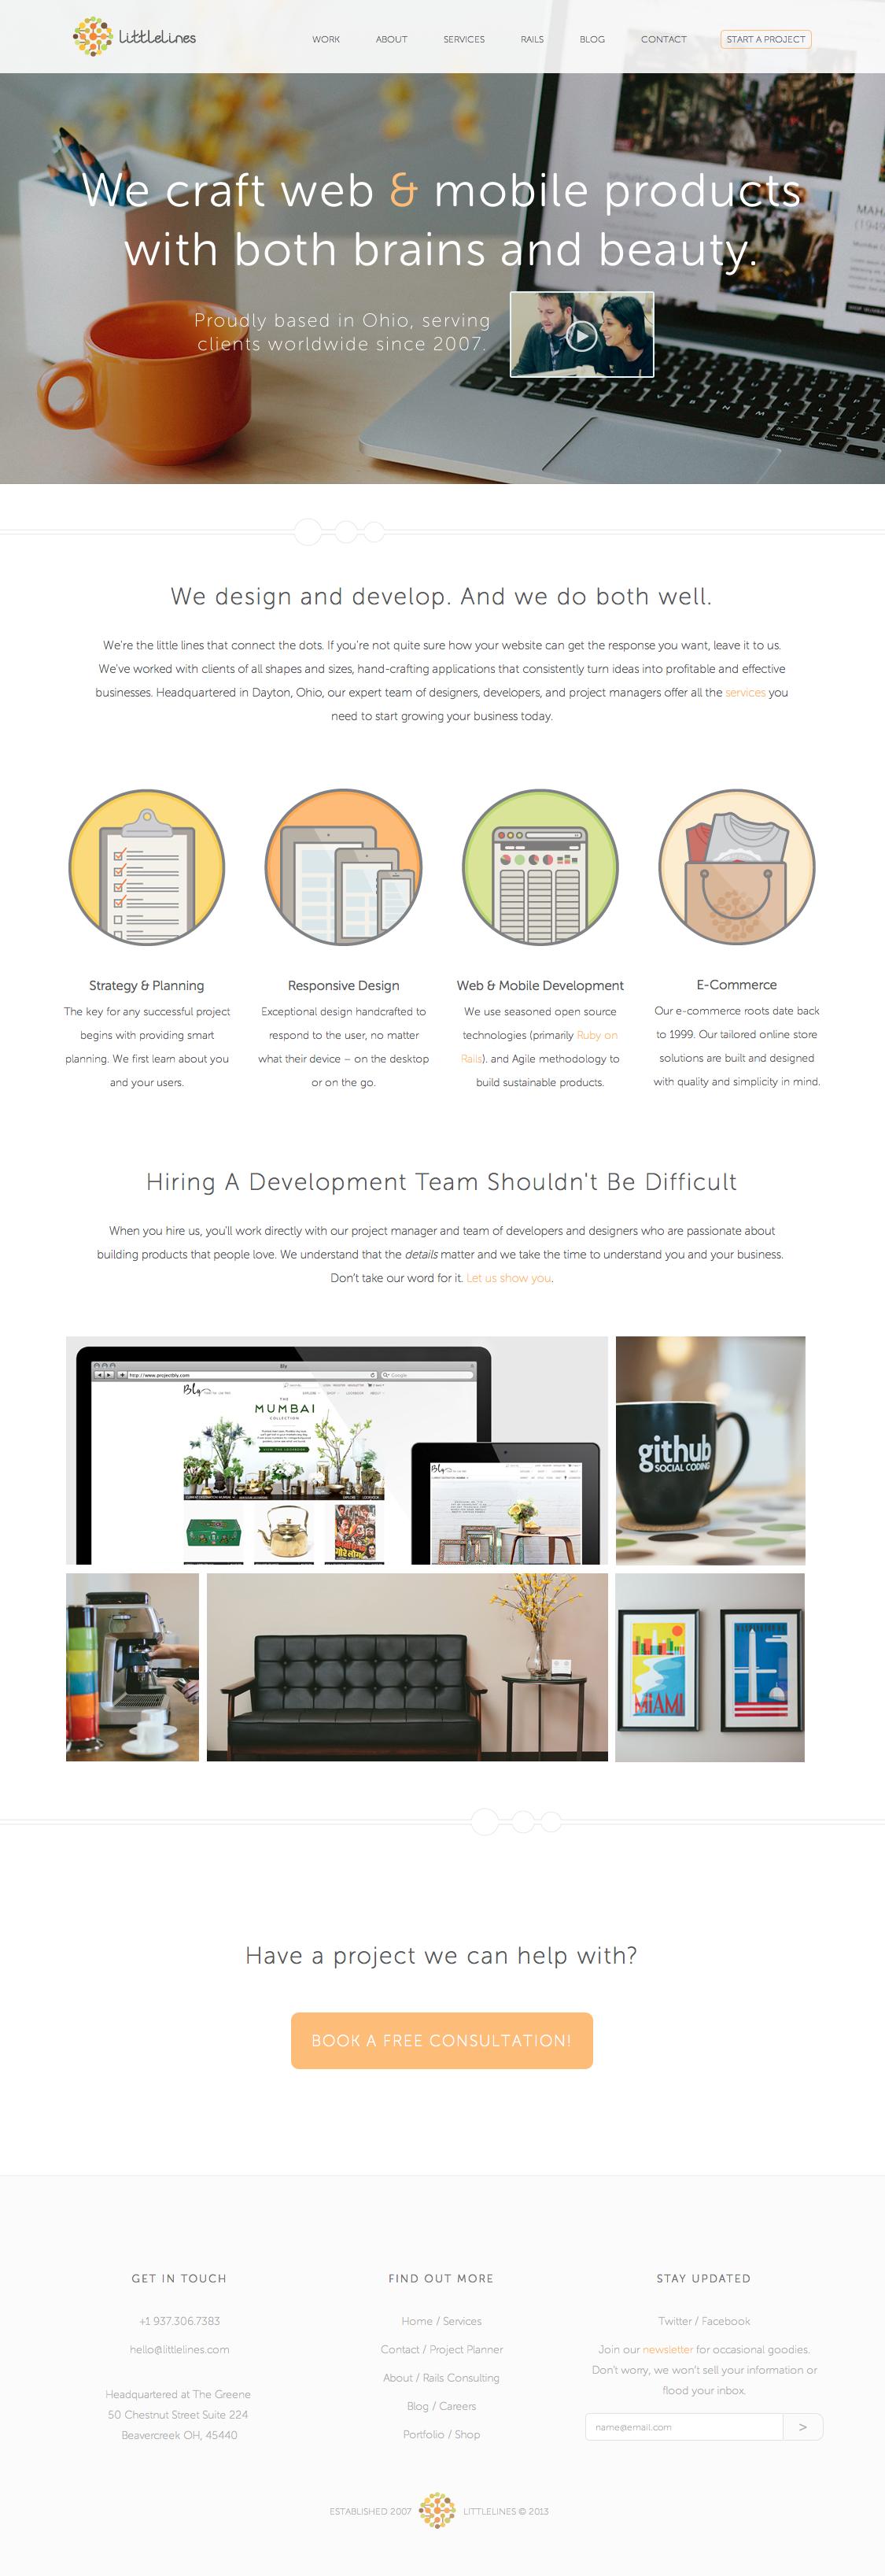 Http Littlelines Com With Images Interactive Design Wellness Design Web Design Inspiration